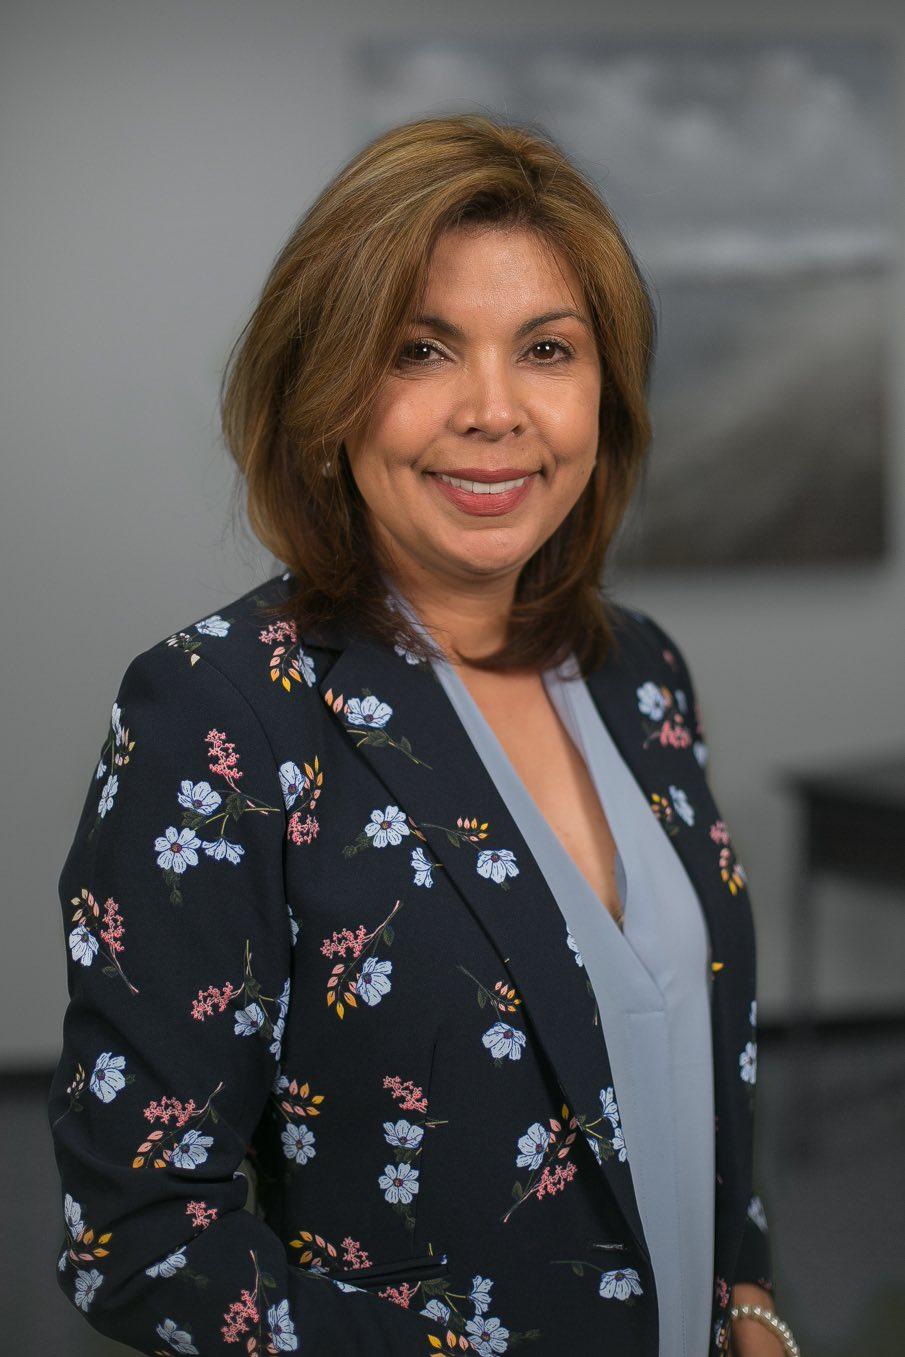 Raquel Romero